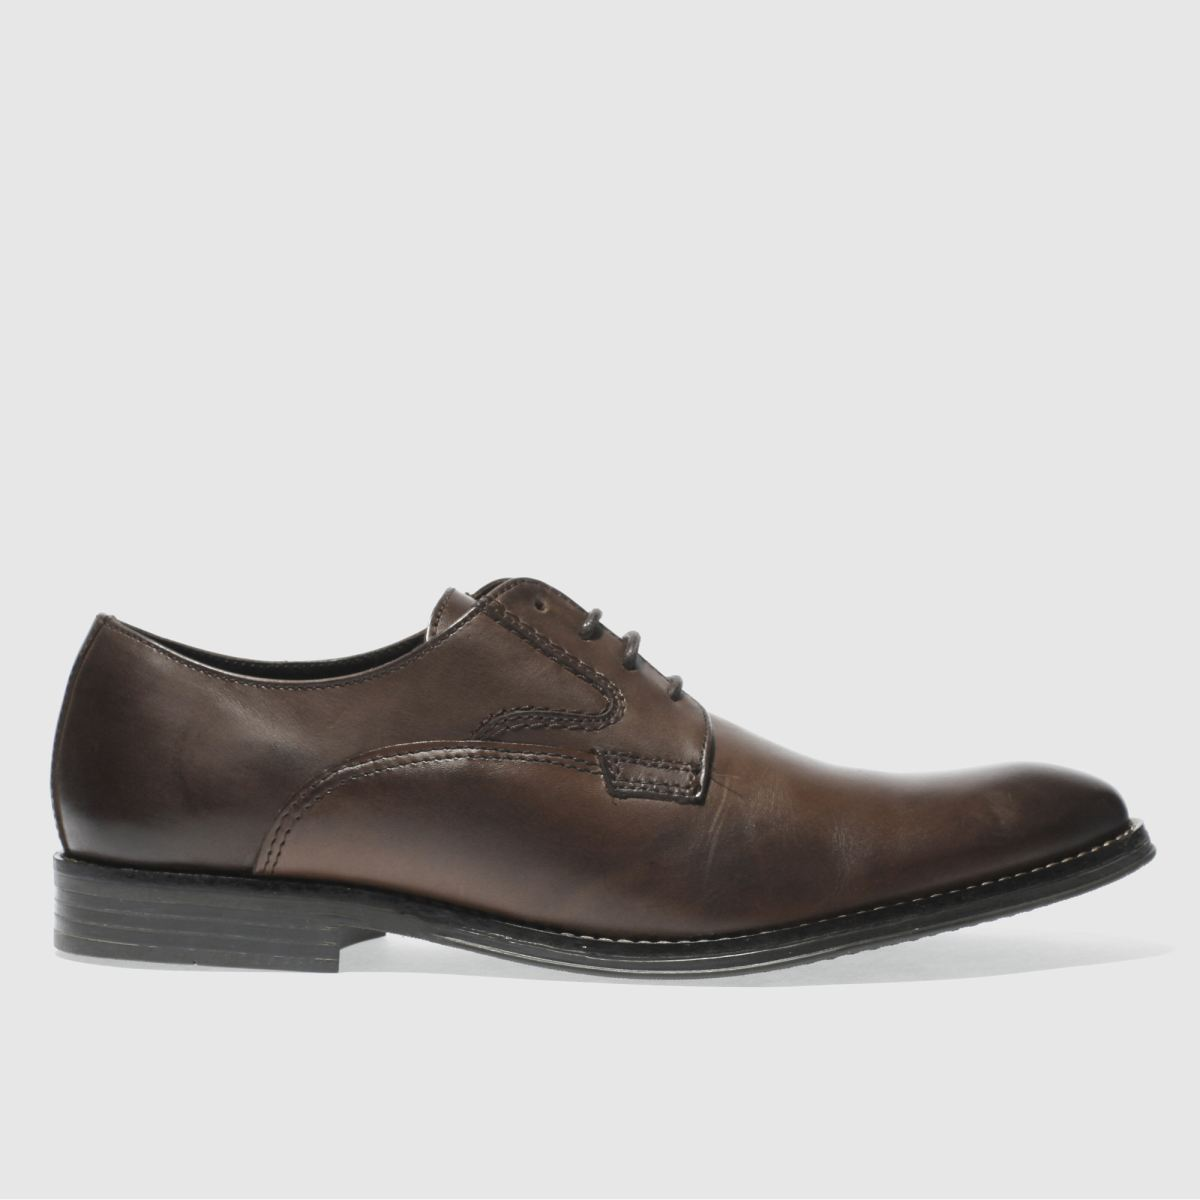 Ikon Shoes Review